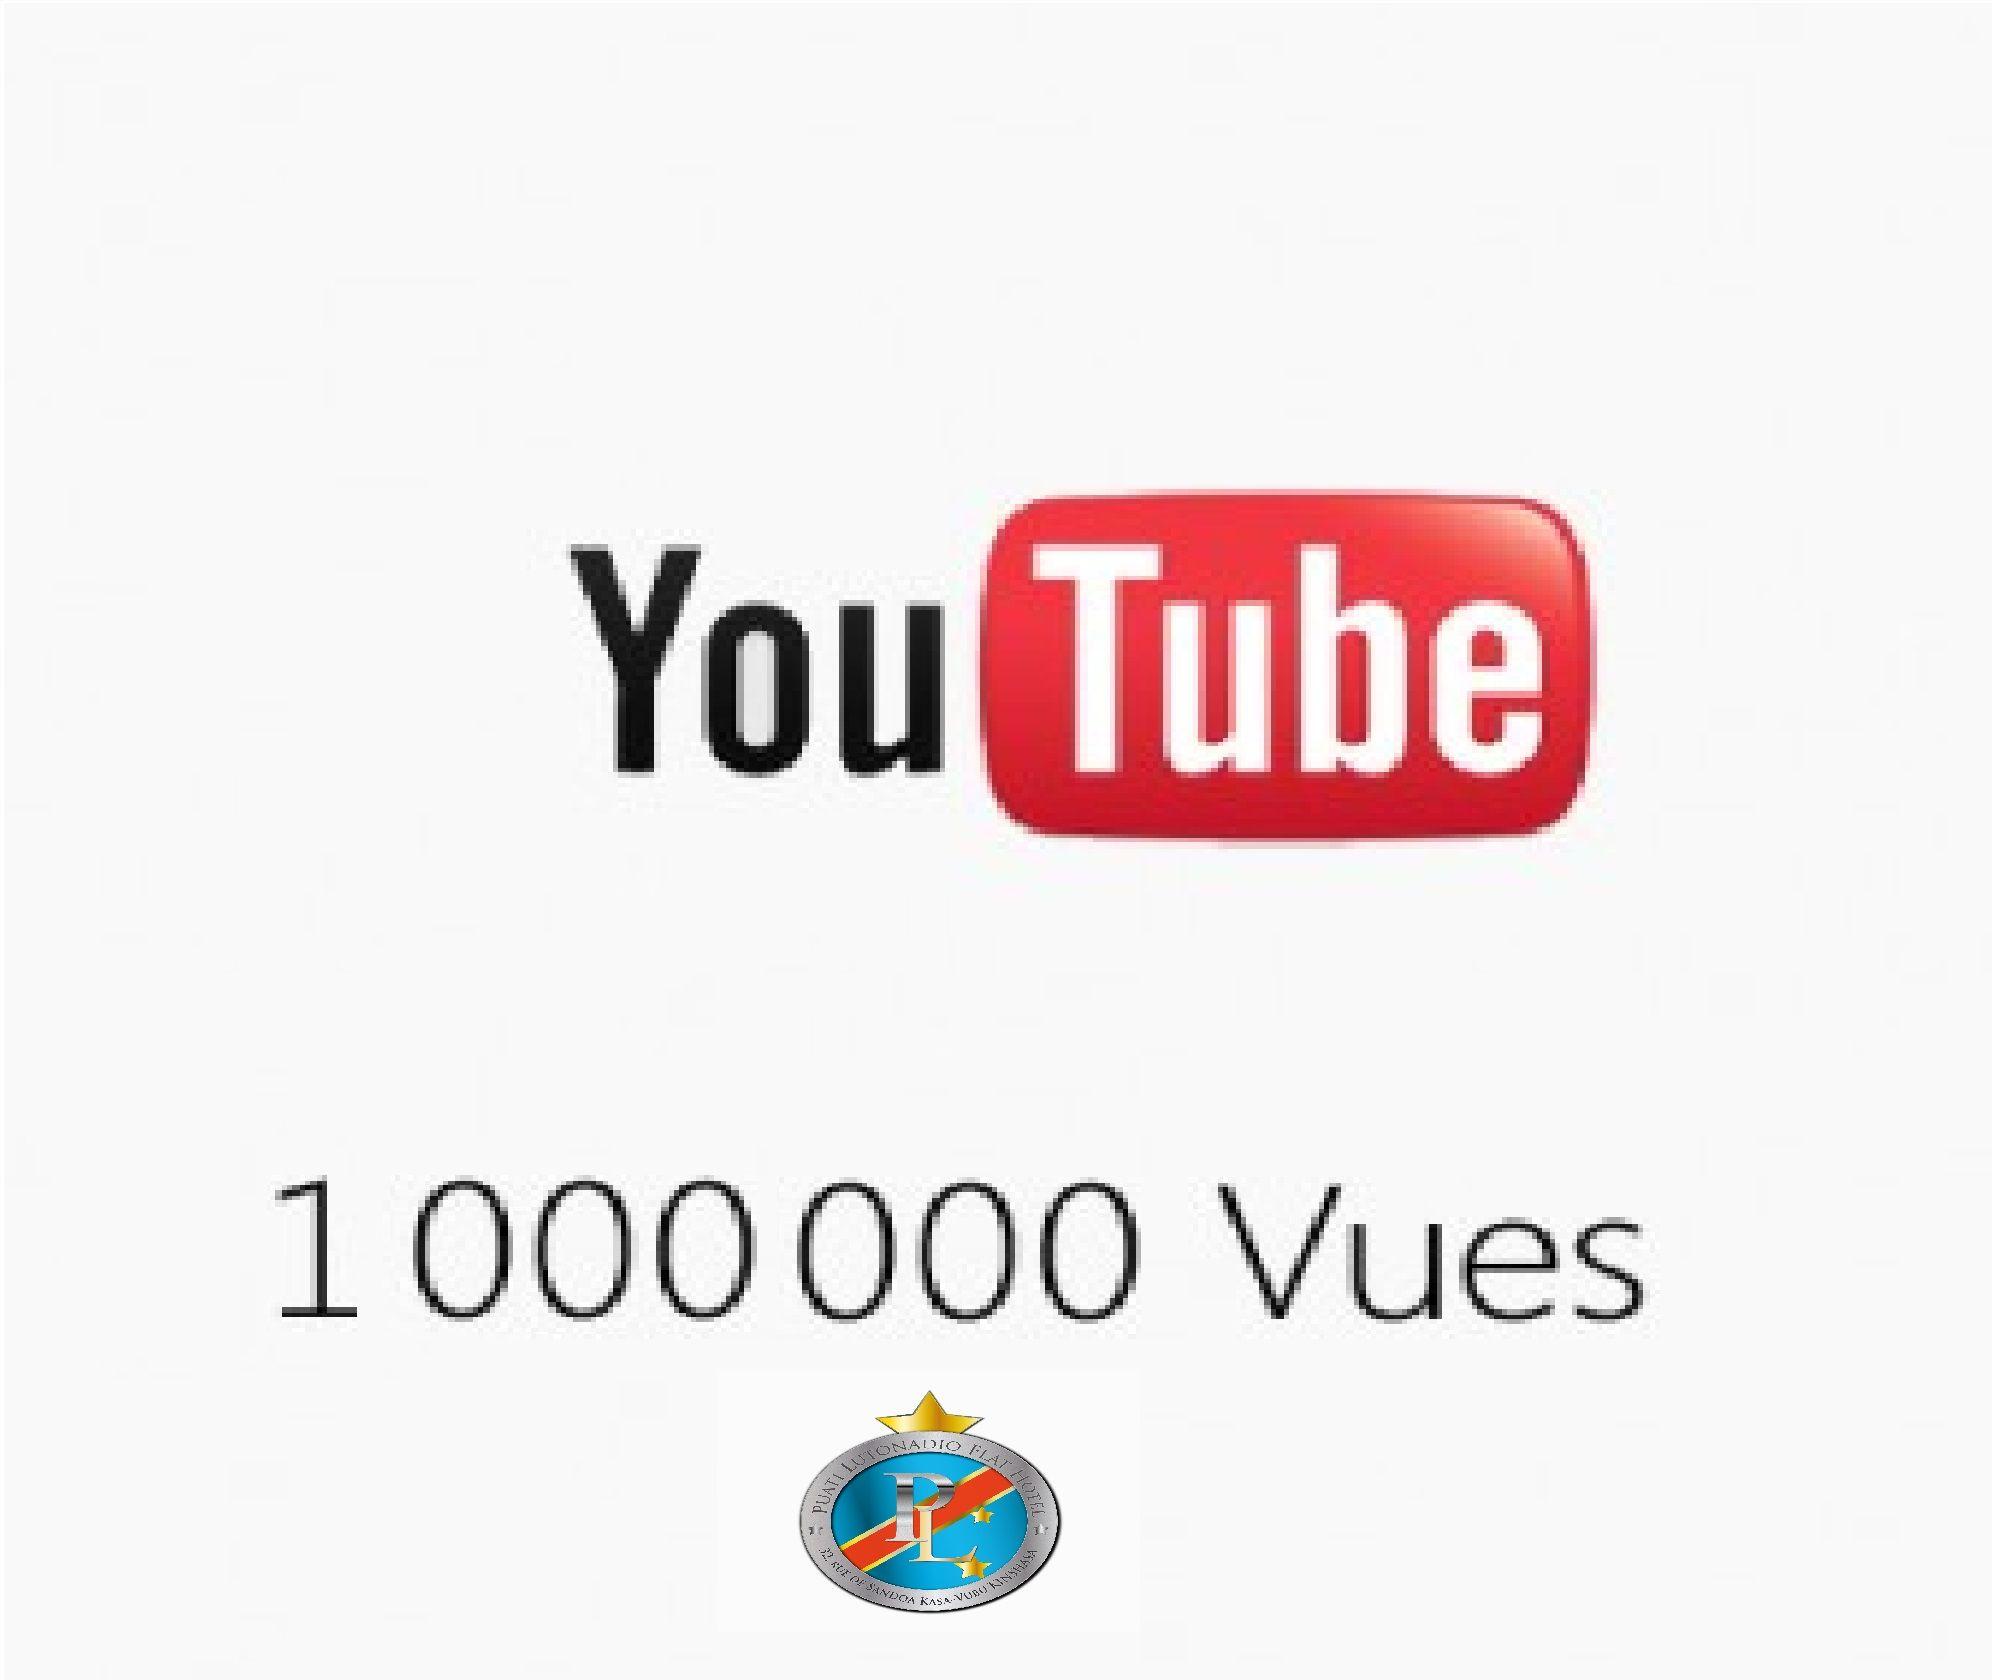 PL ekokisi efúku mokó ya etalemi na Youtube PL a atteint un million de vues sur Youtube PL has reached one million views on Youtube PL ha alcanzado el millón de visitas en Youtube